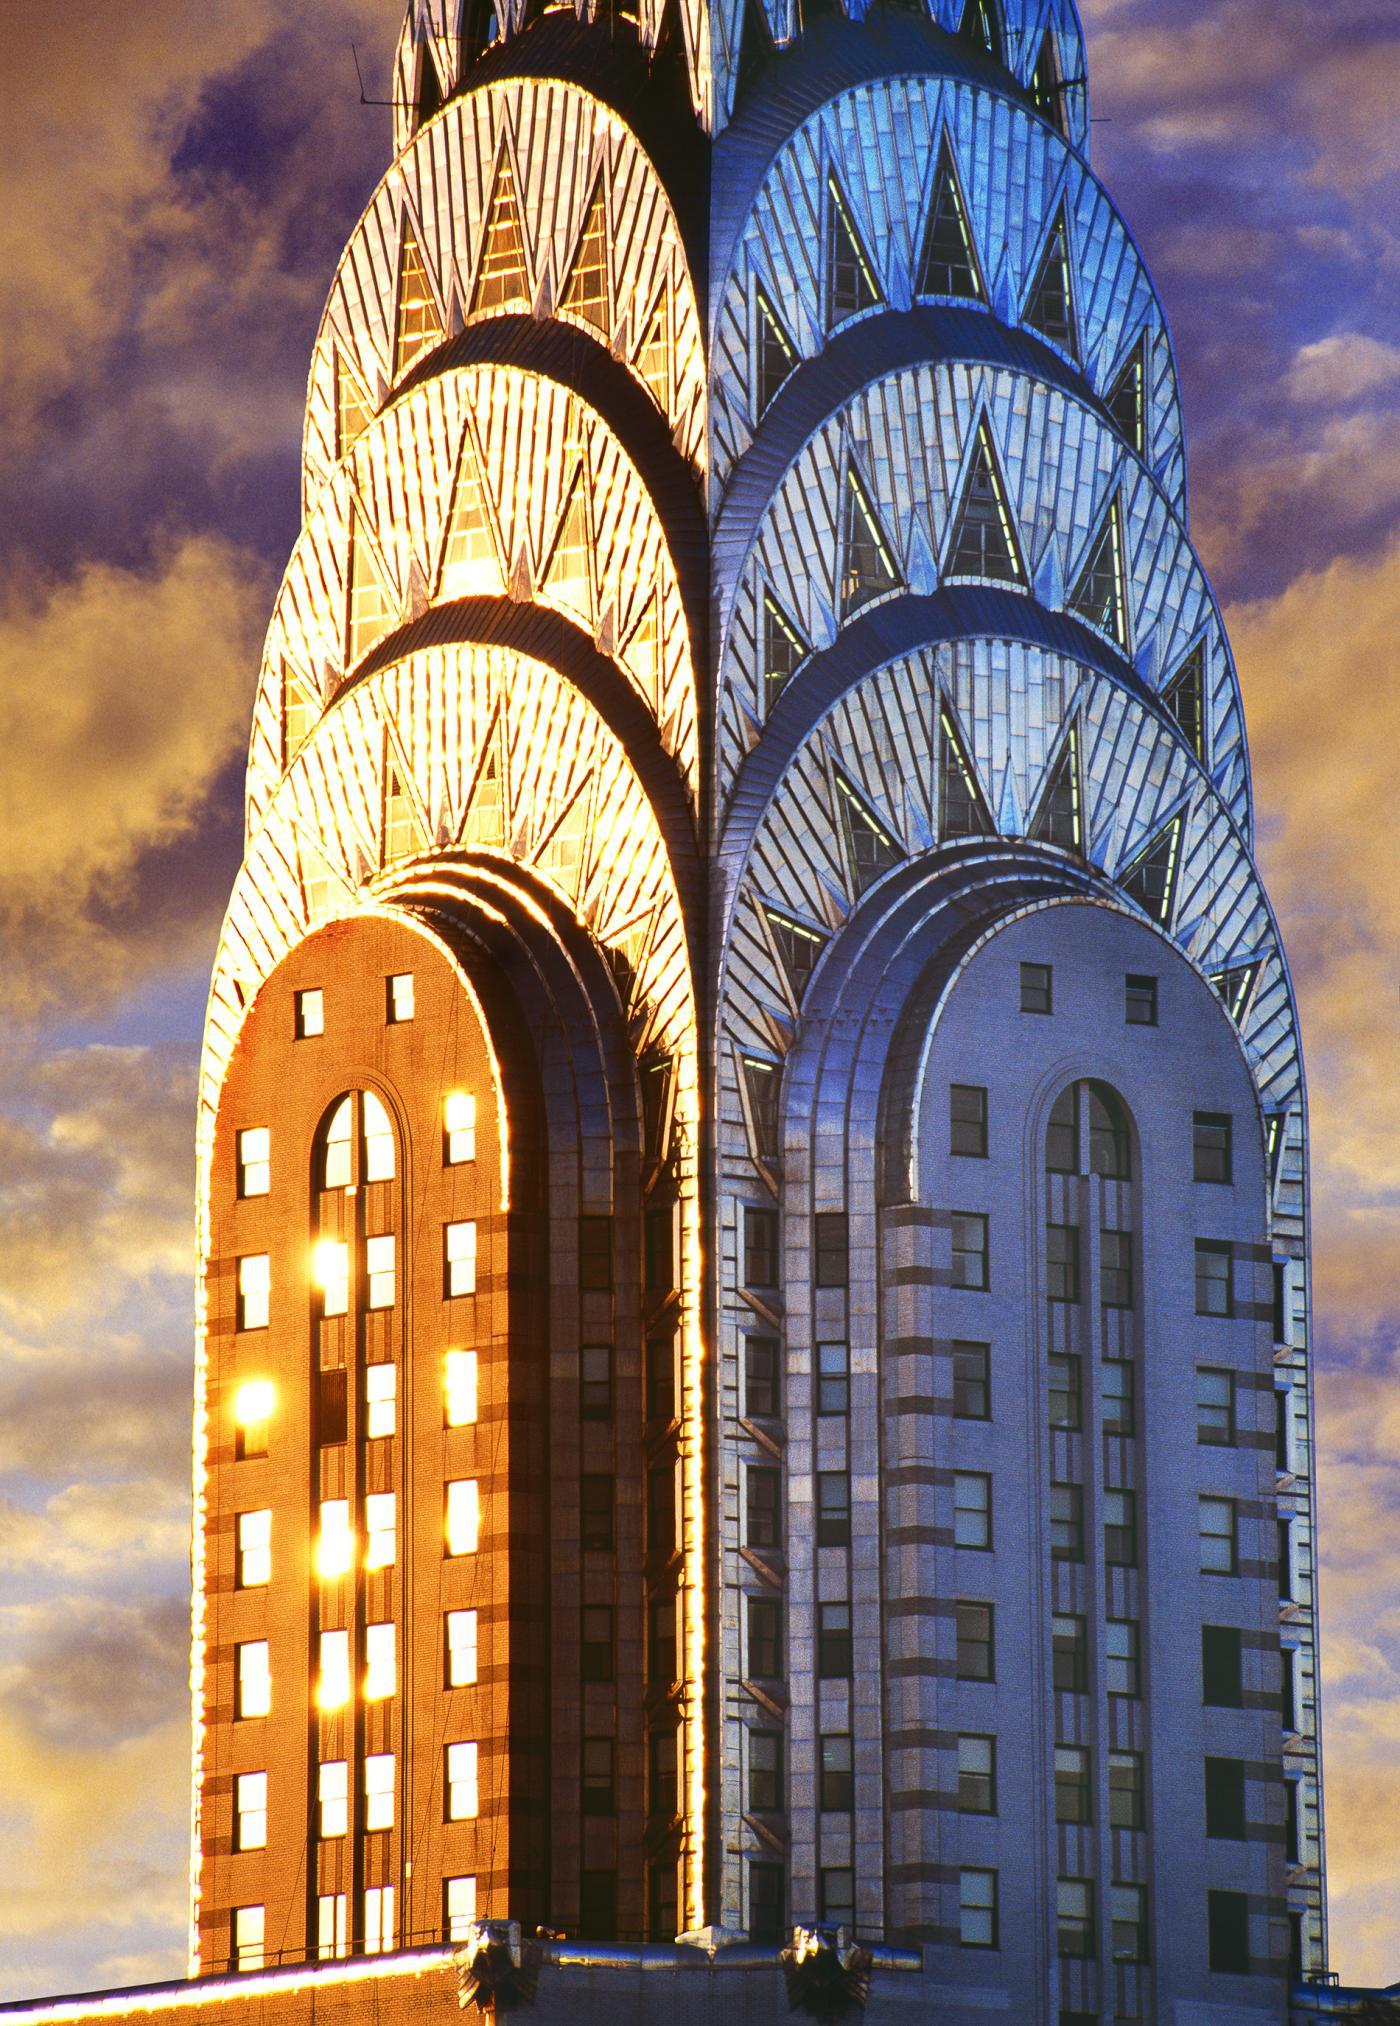 Mitchell Funk - Chrysler Building Art Deco Skyscraper